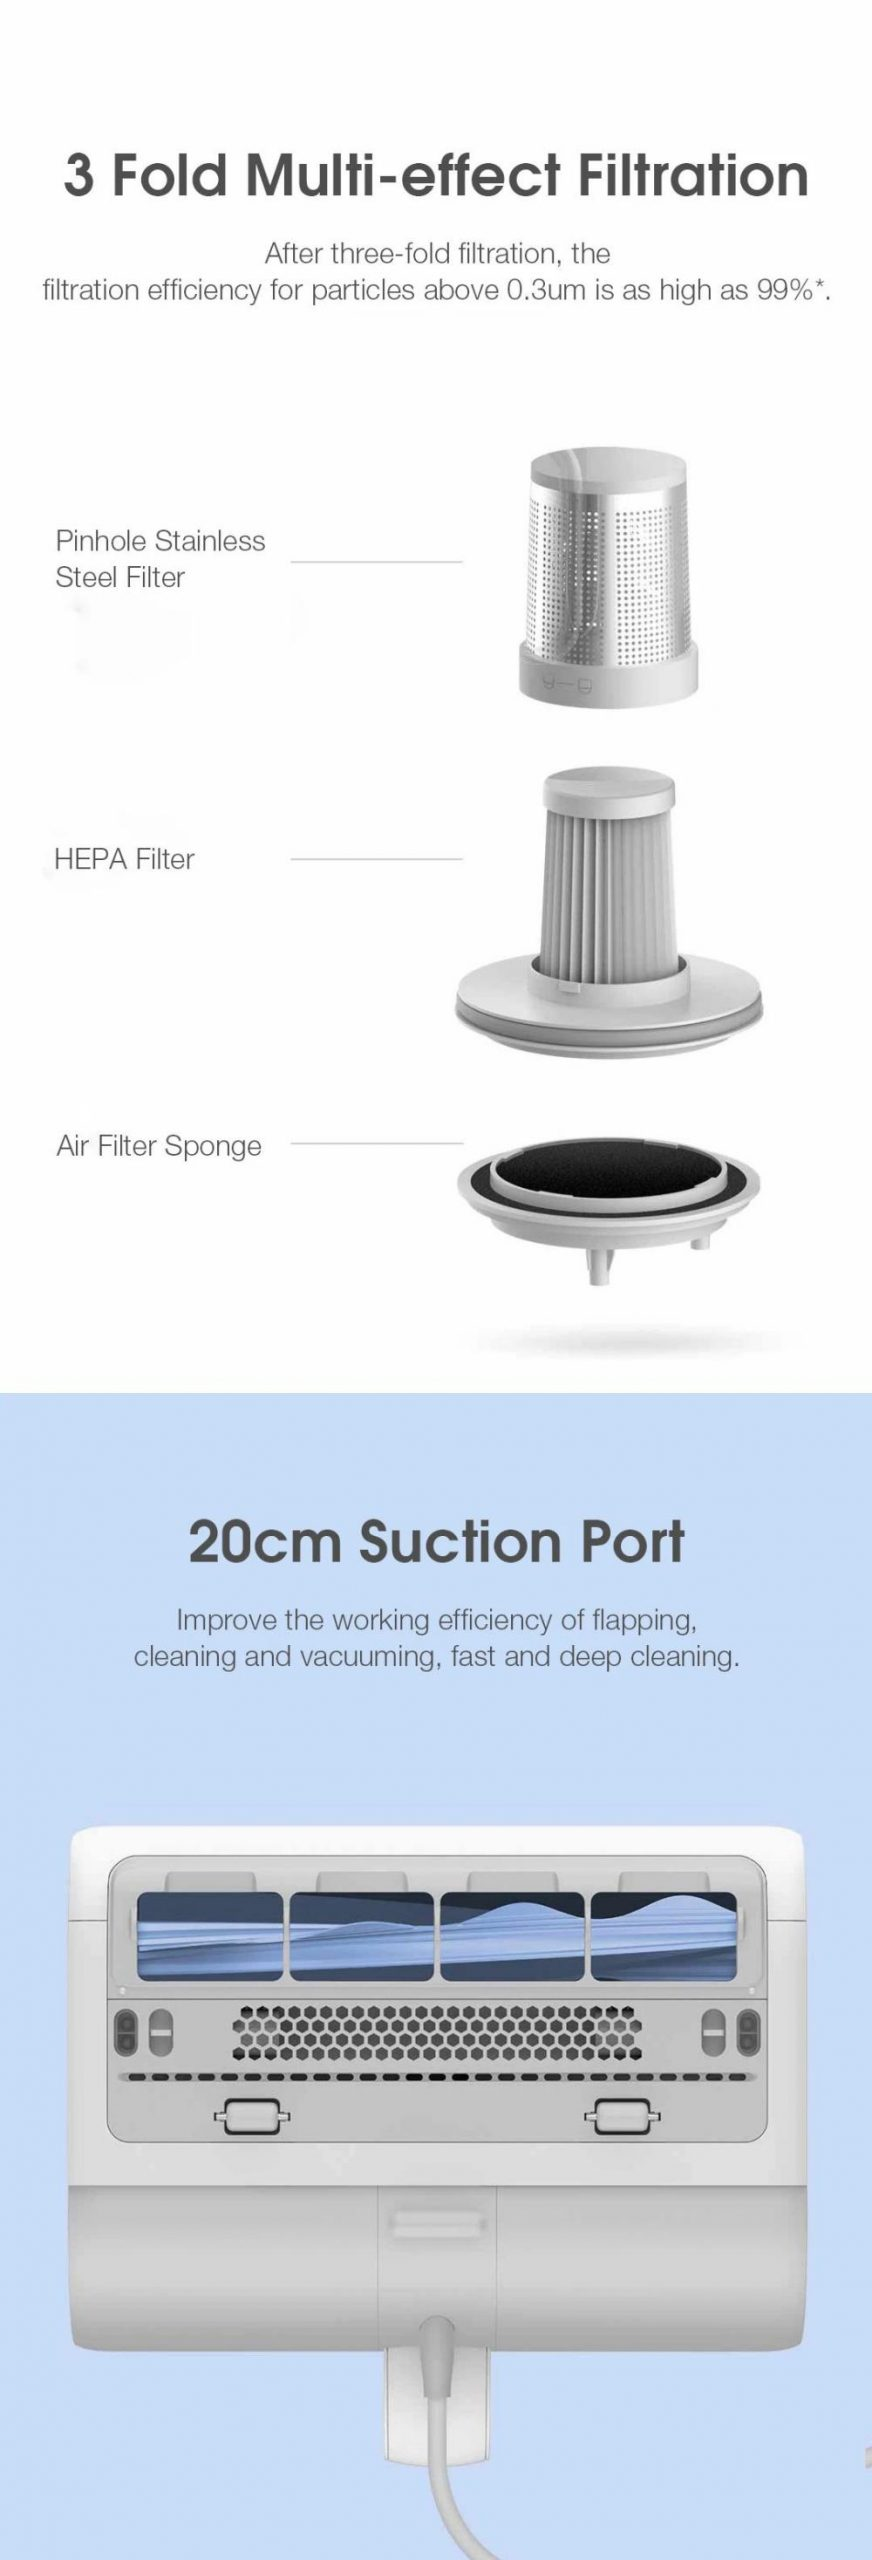 Mini Xiaomi Mijia Uv Sterilization Anti Mites Mattress Vacuum Cleaner 12000pa Strong Suction (4)